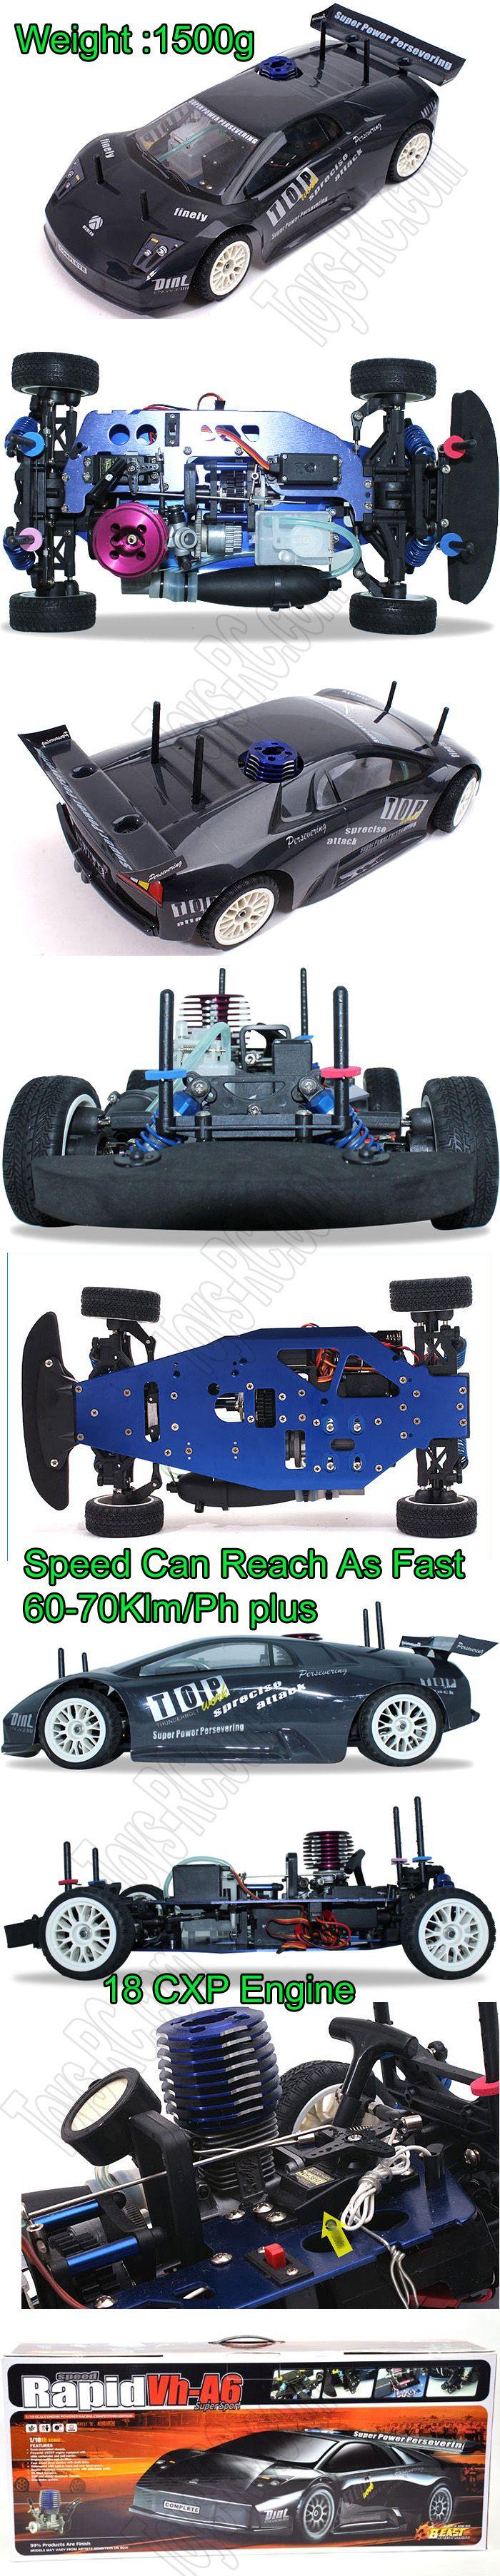 Victory hawk 4wd speed rapid vh a6 rc nitro gas car http